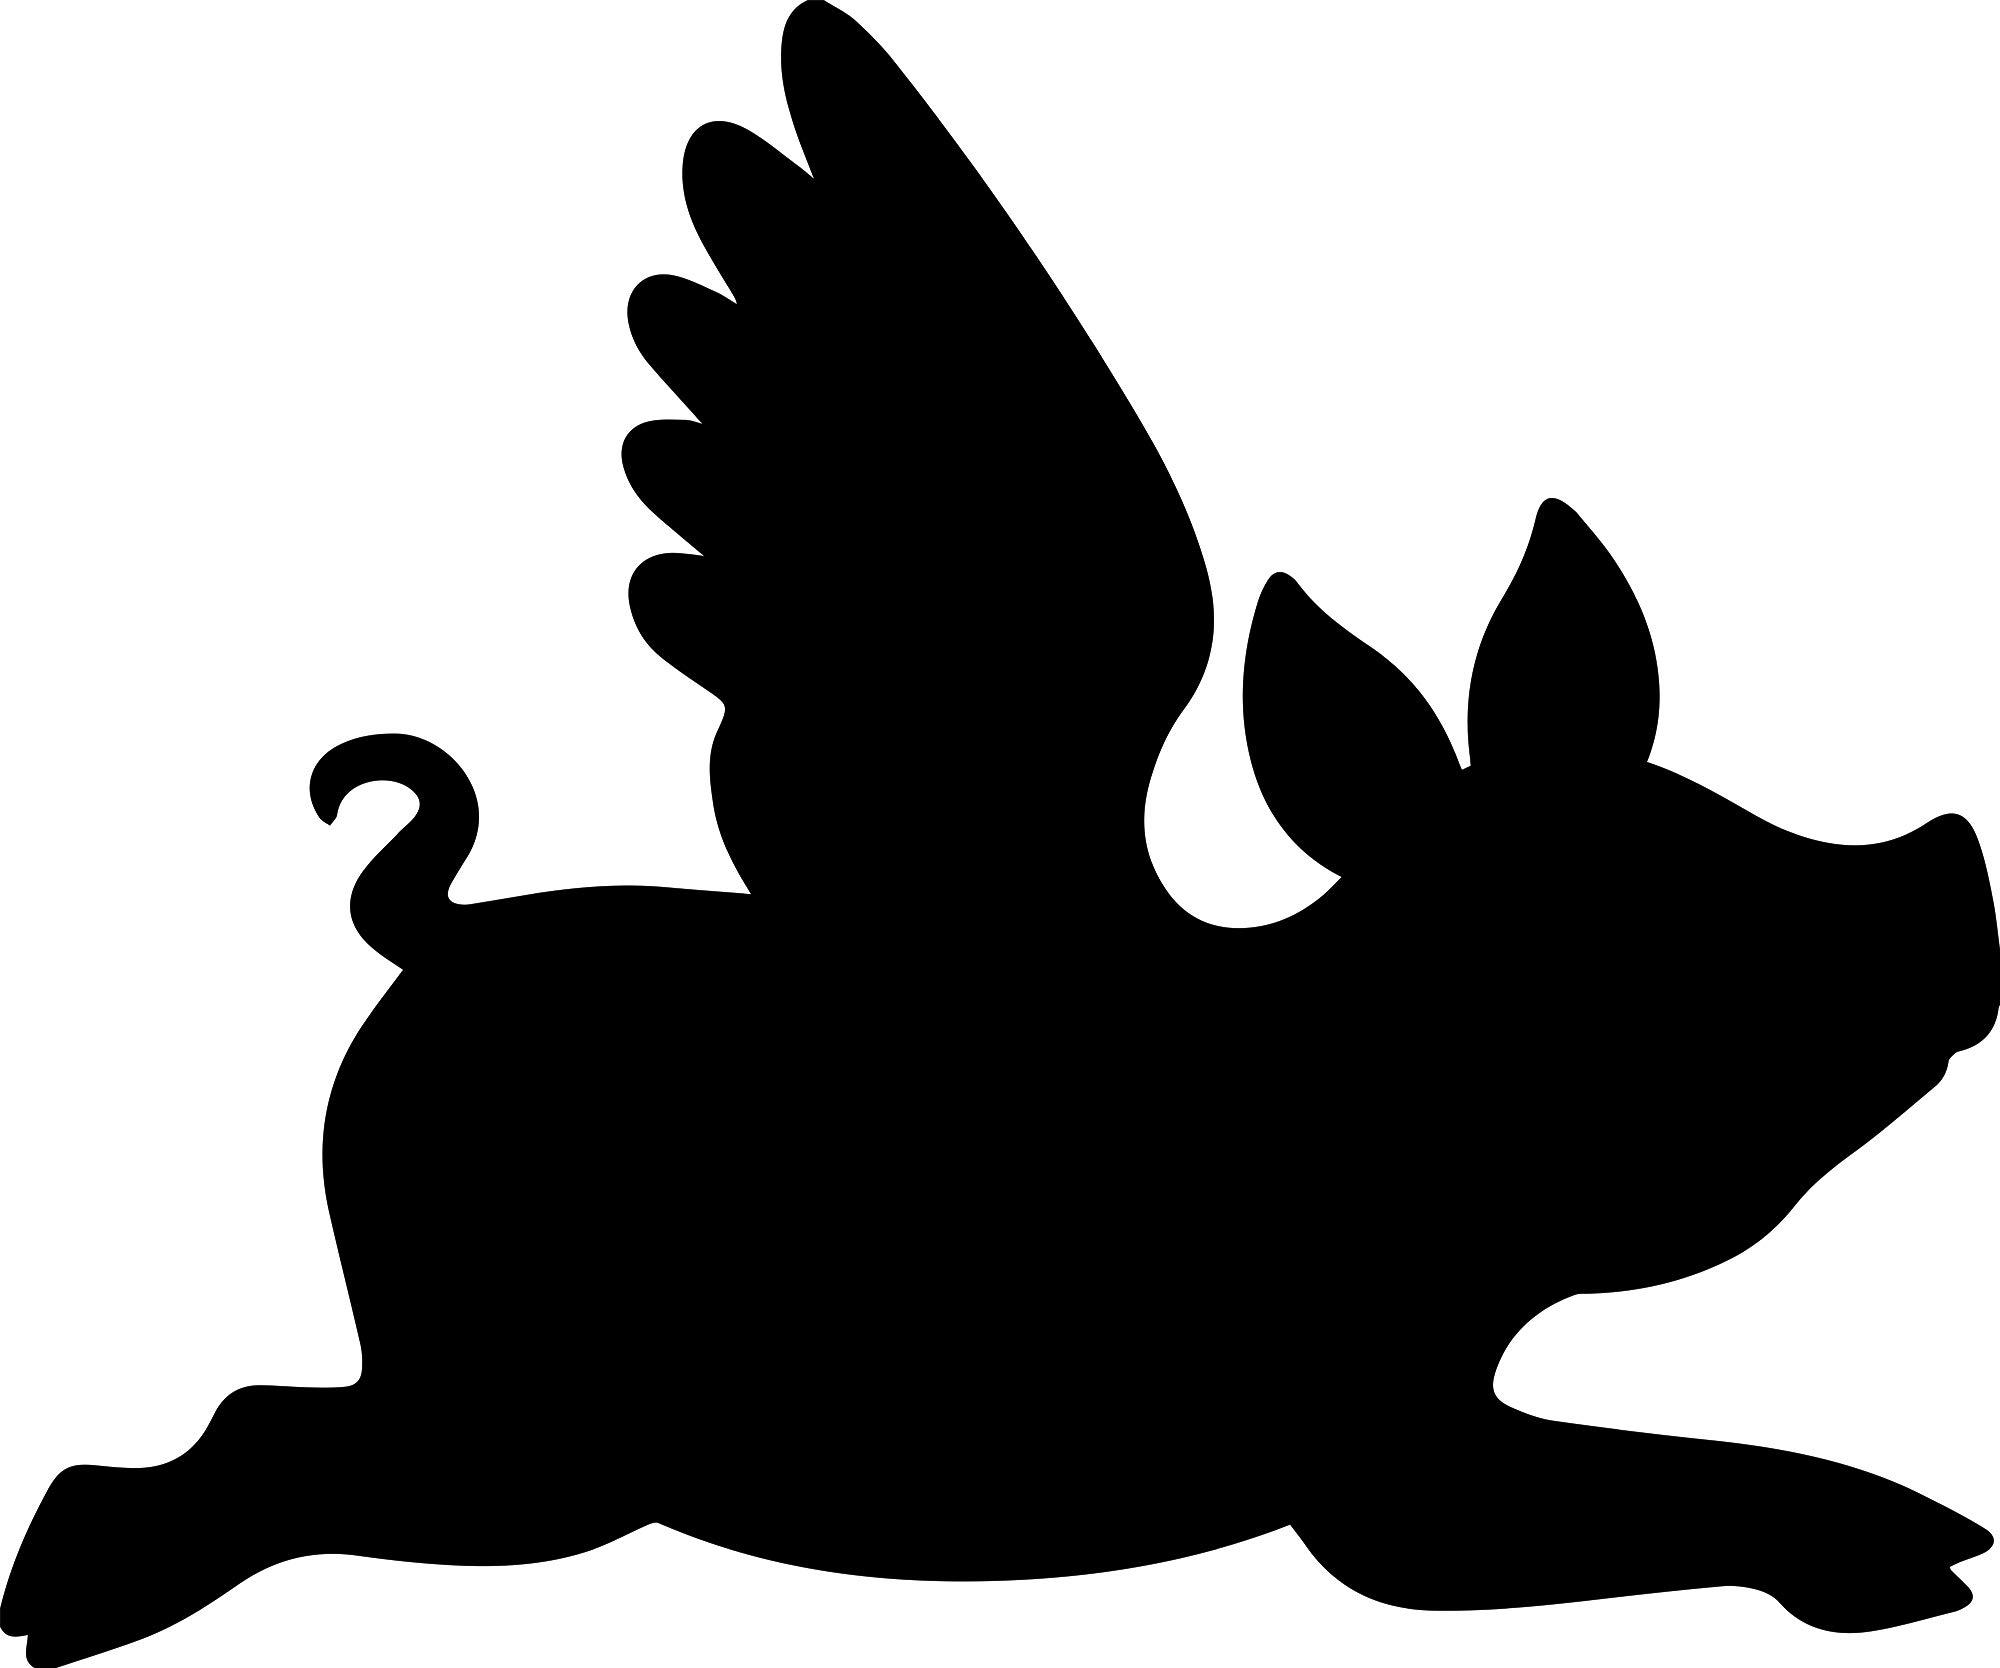 ANGDEST Flying Pig Silhouette (Black) Waterproof Vinyl Decal Stickers for Laptop Phone Helmet Car Window Bumper Mug Tuber Cup Door Wall Decoration